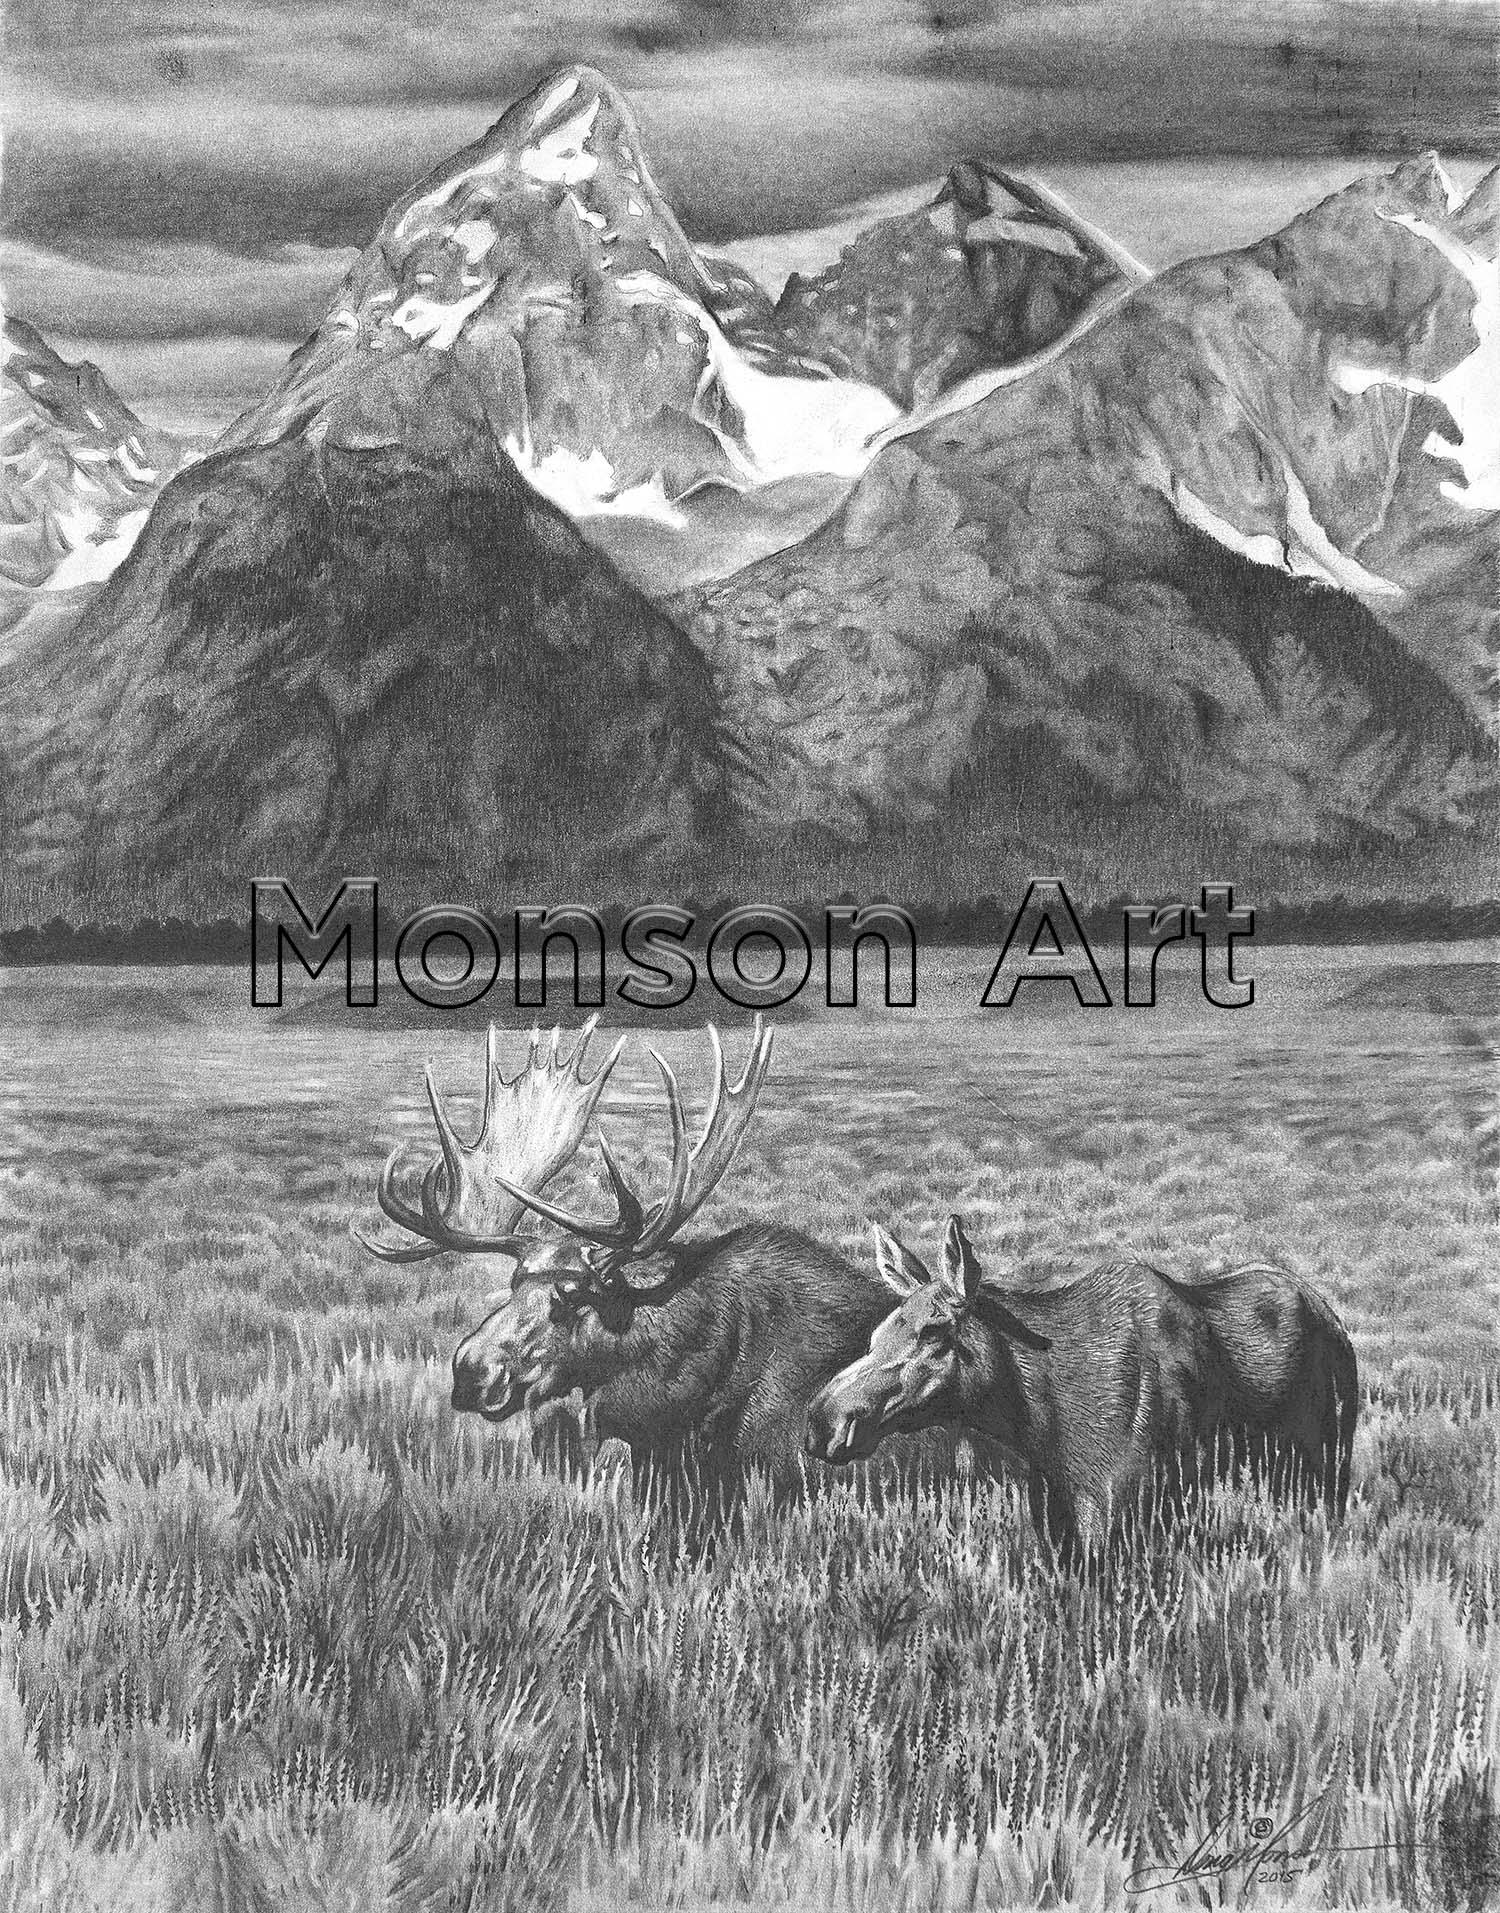 Monson160509-01